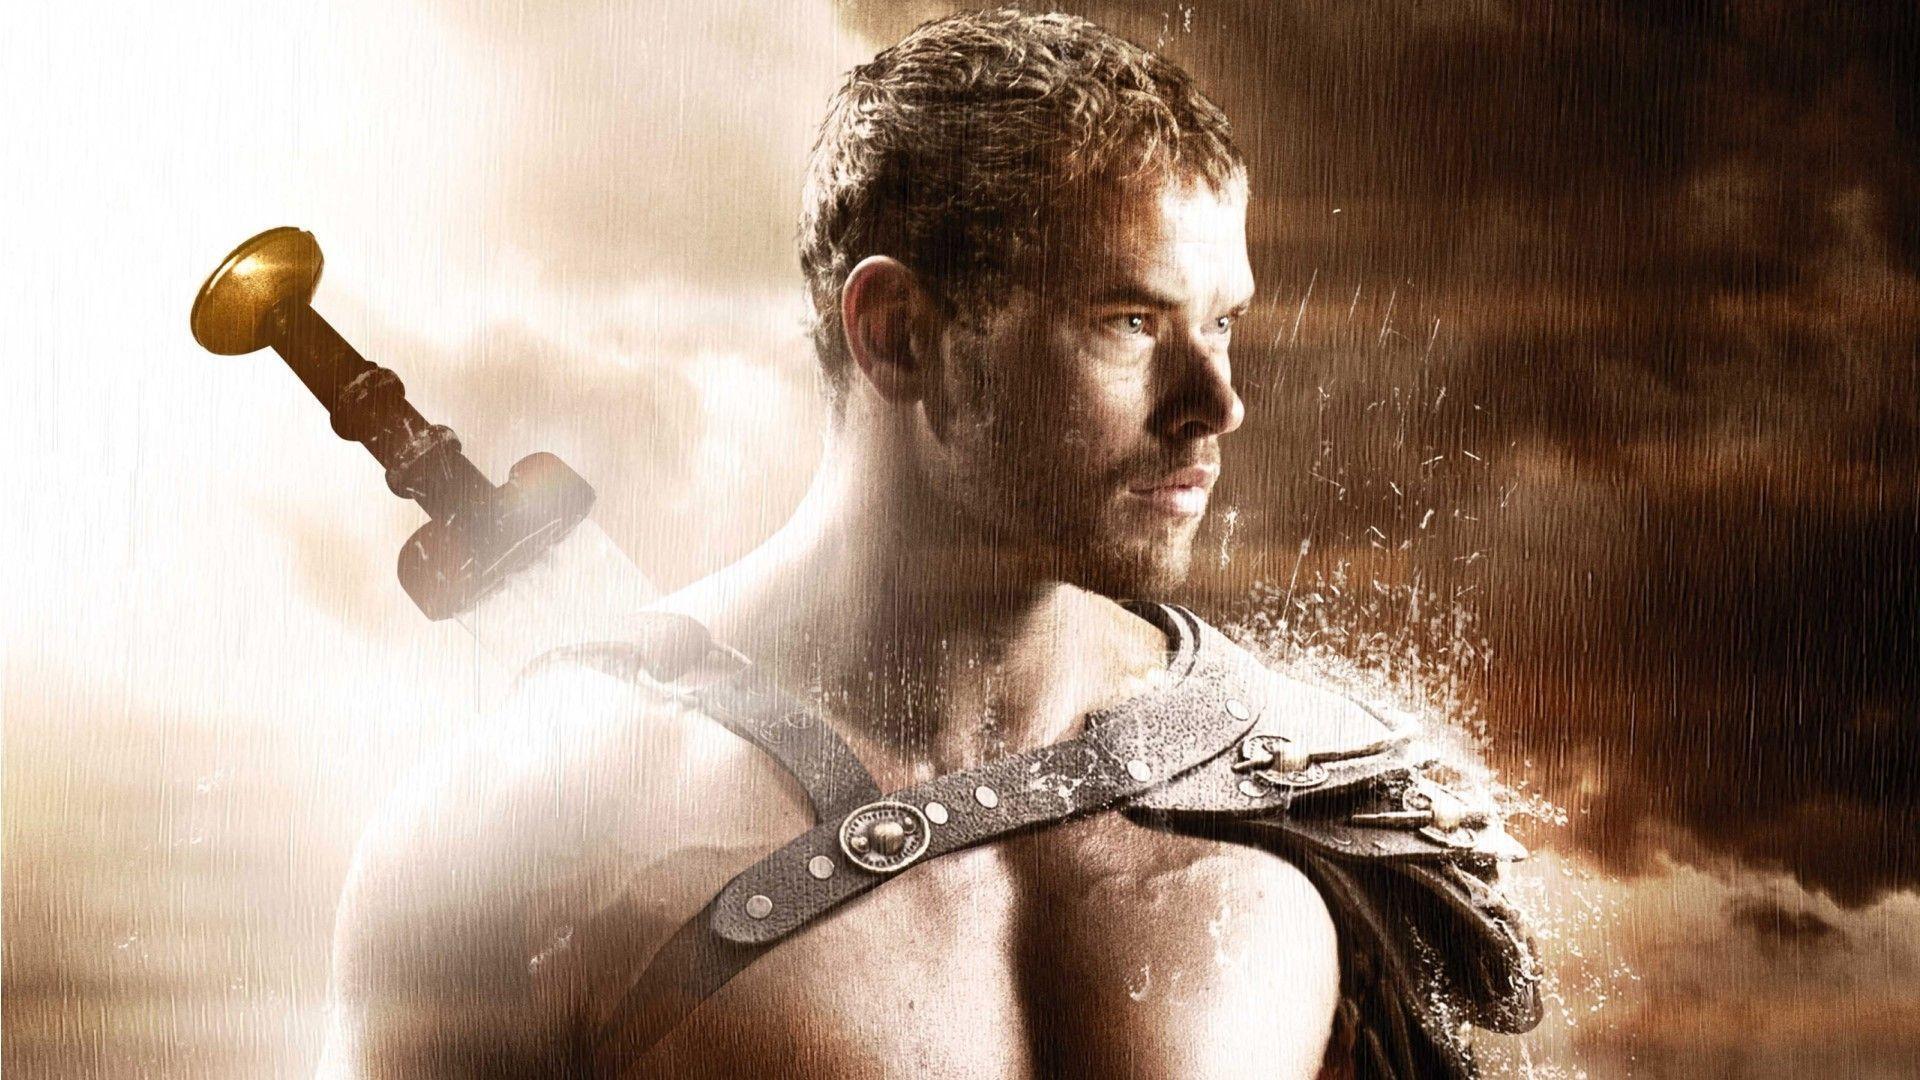 Hercules 2014 - wallpaper.